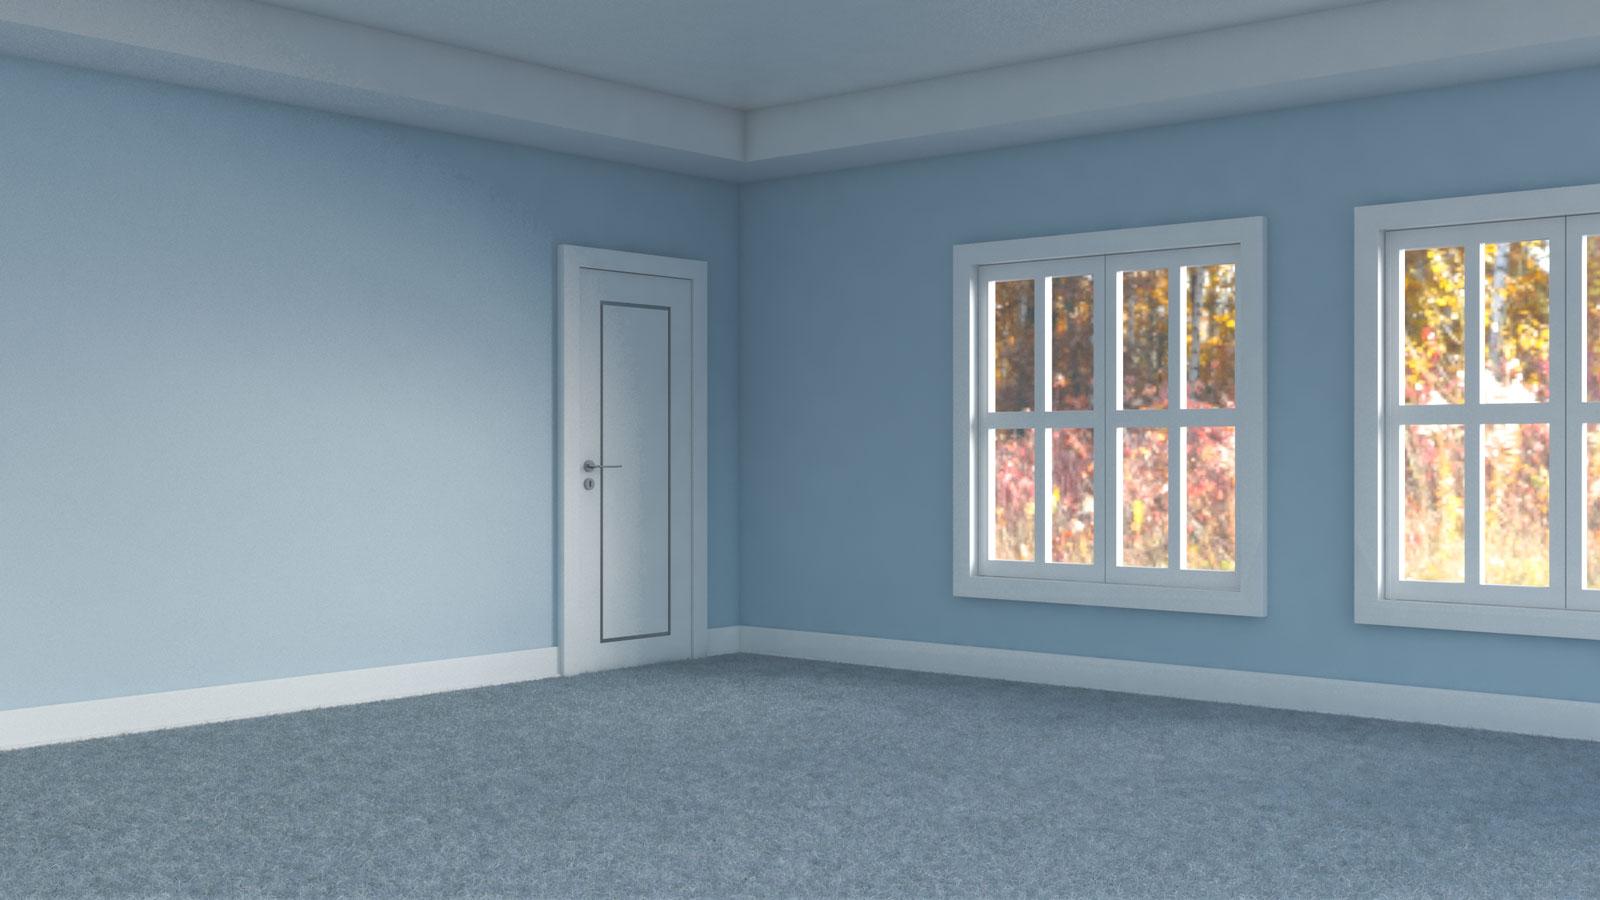 Dusty blue carpet floors with light blue walls